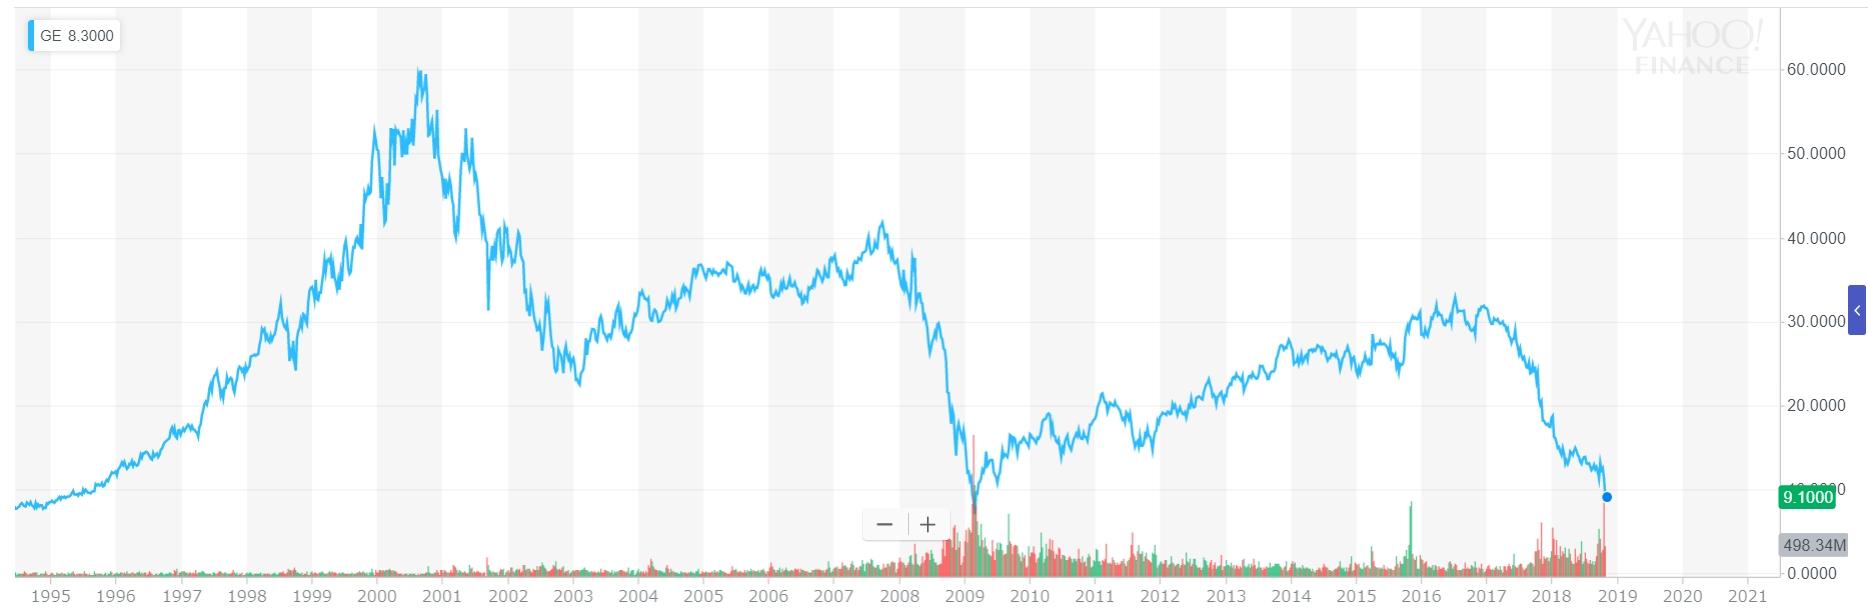 GEの株価